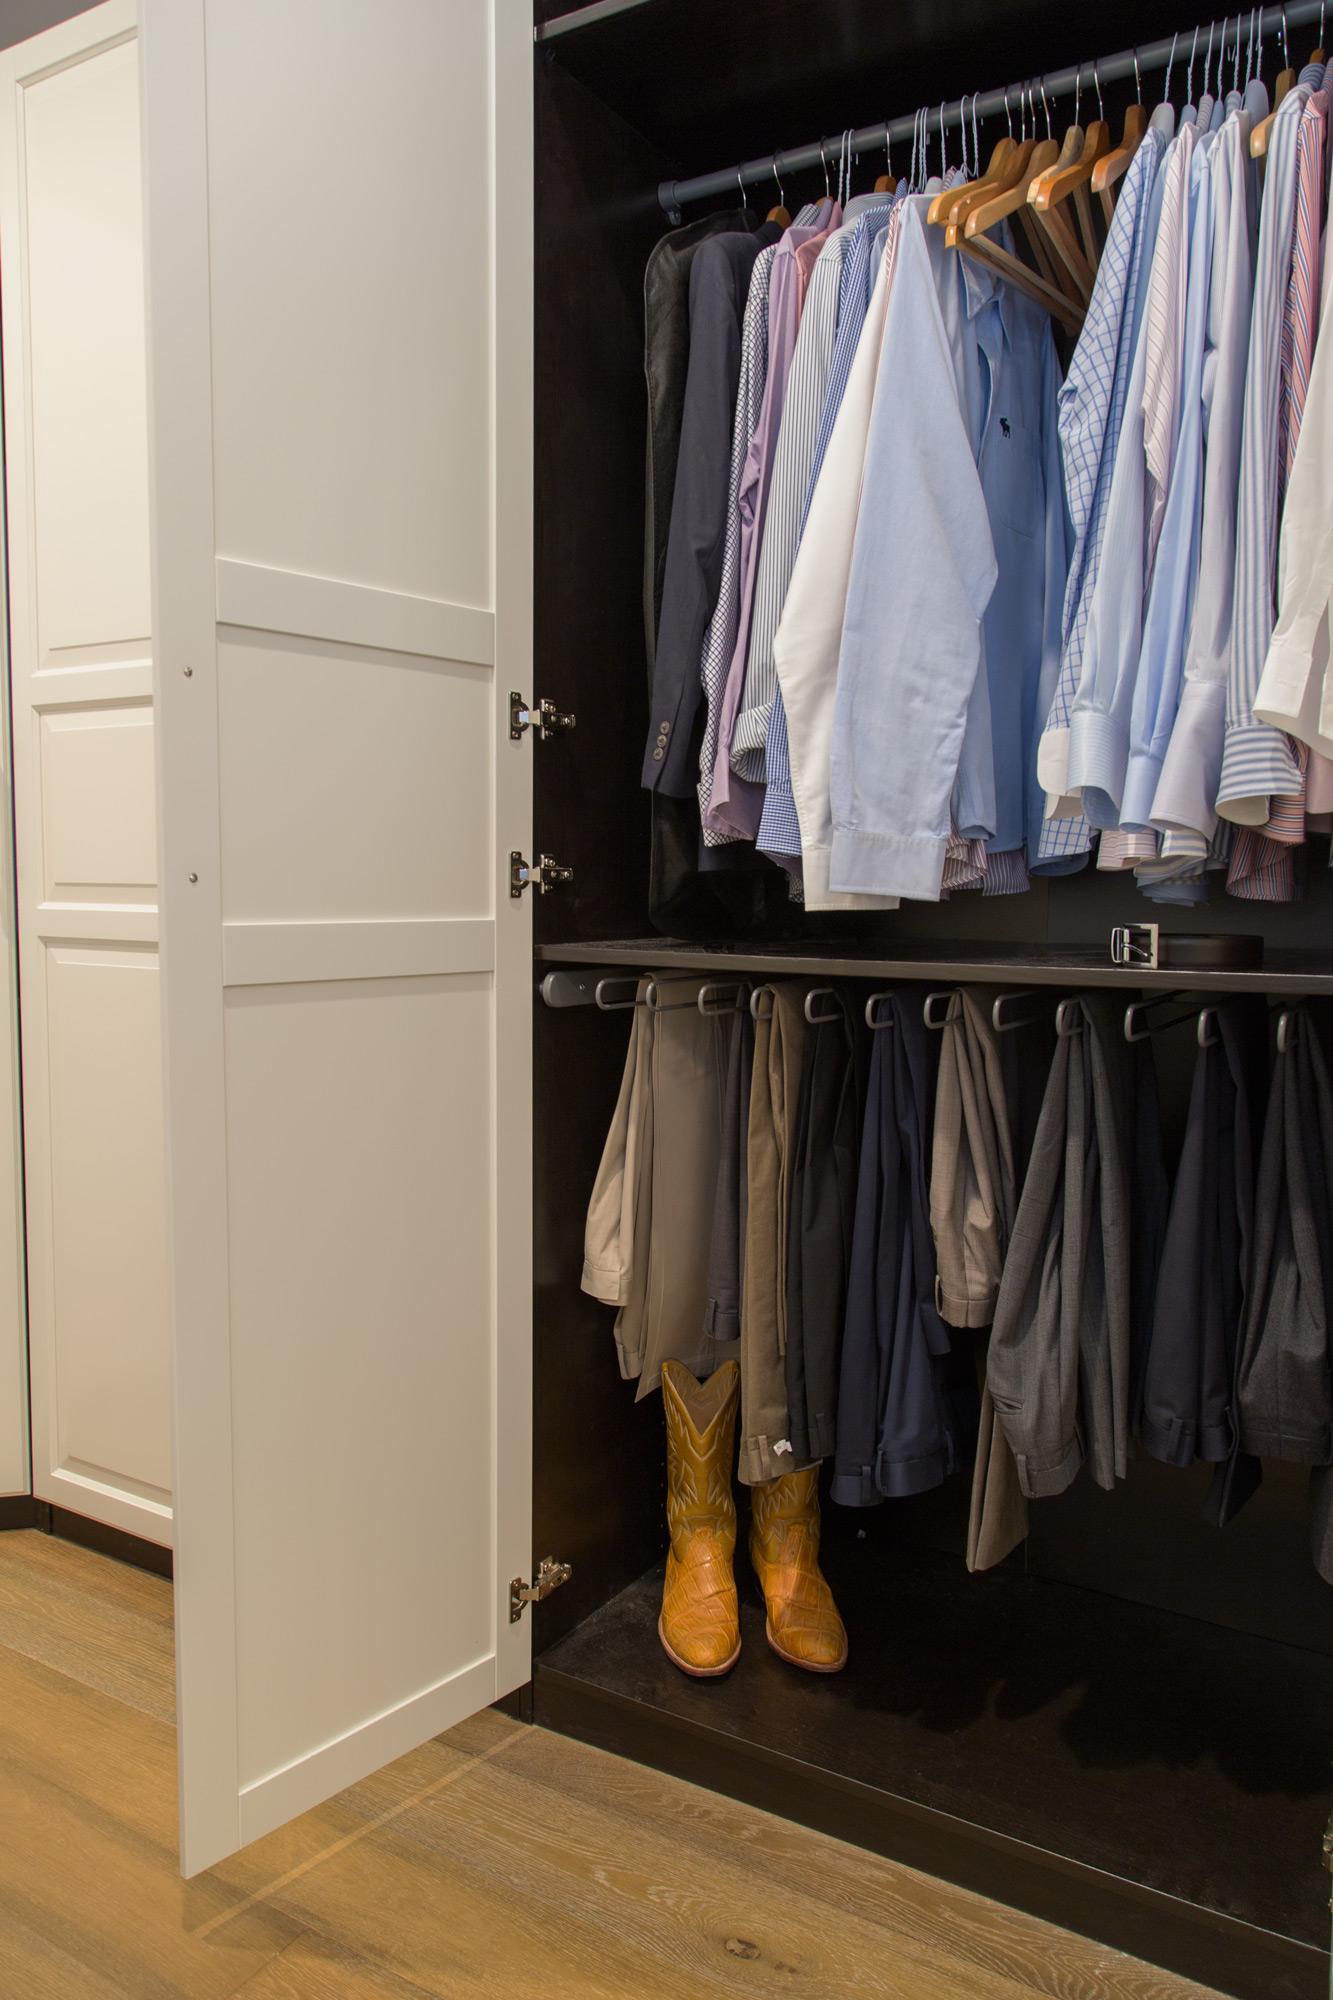 Master bathroom & closet remodel; | Interior Designer: Carla Aston / Photographer: Tori Aston #customcloset #ikeacloset #closetcabinet